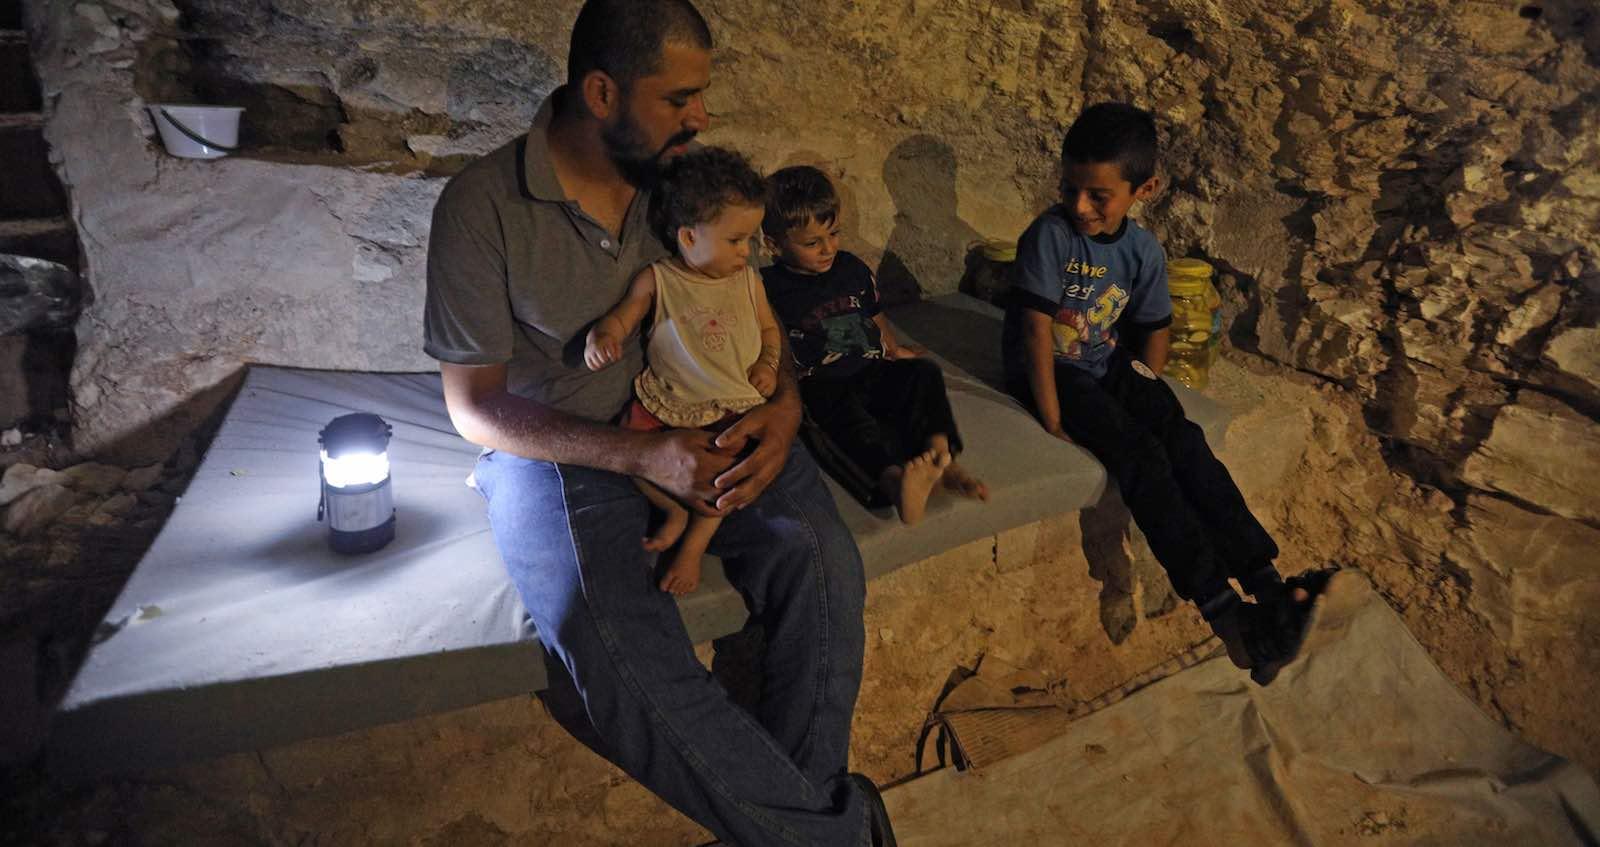 A family in an underground bunker, preparing for strikes in Idlib province, Syria (`Photo: Omar Haj Kadour via Getty)